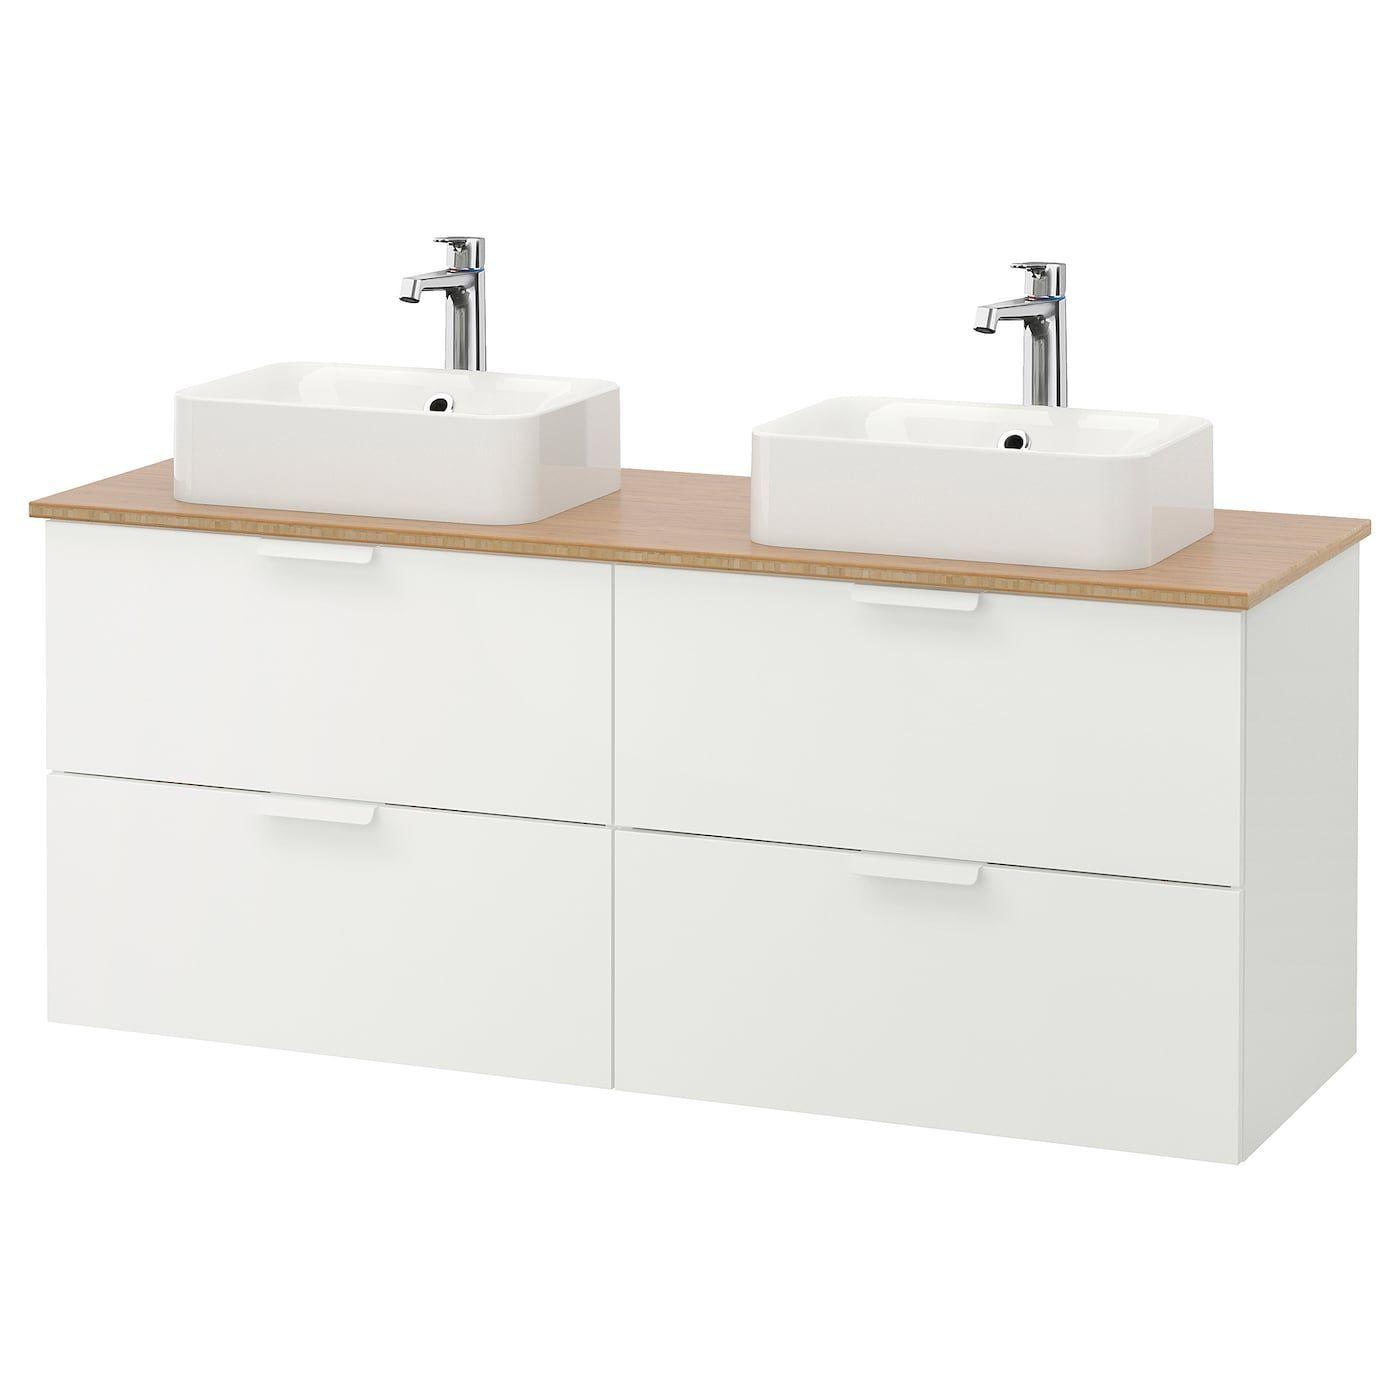 Bamboo Bathroom Brogrund Faucet Godmorgontolken Horvik Ikea